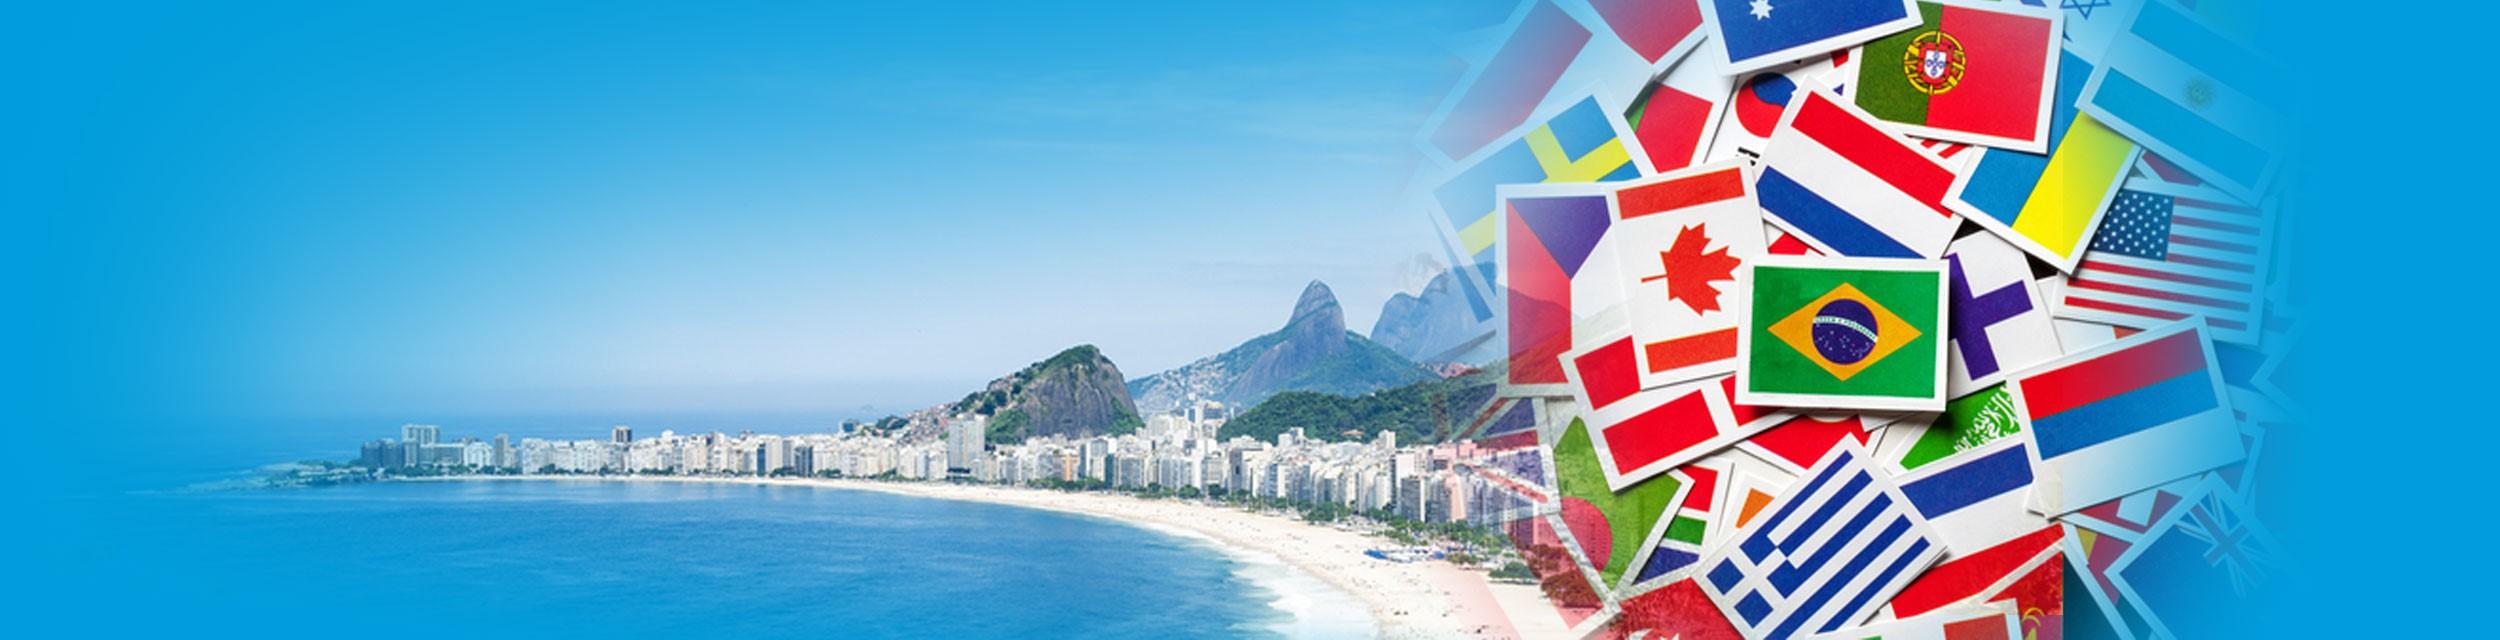 Corruptie Olympische spelen